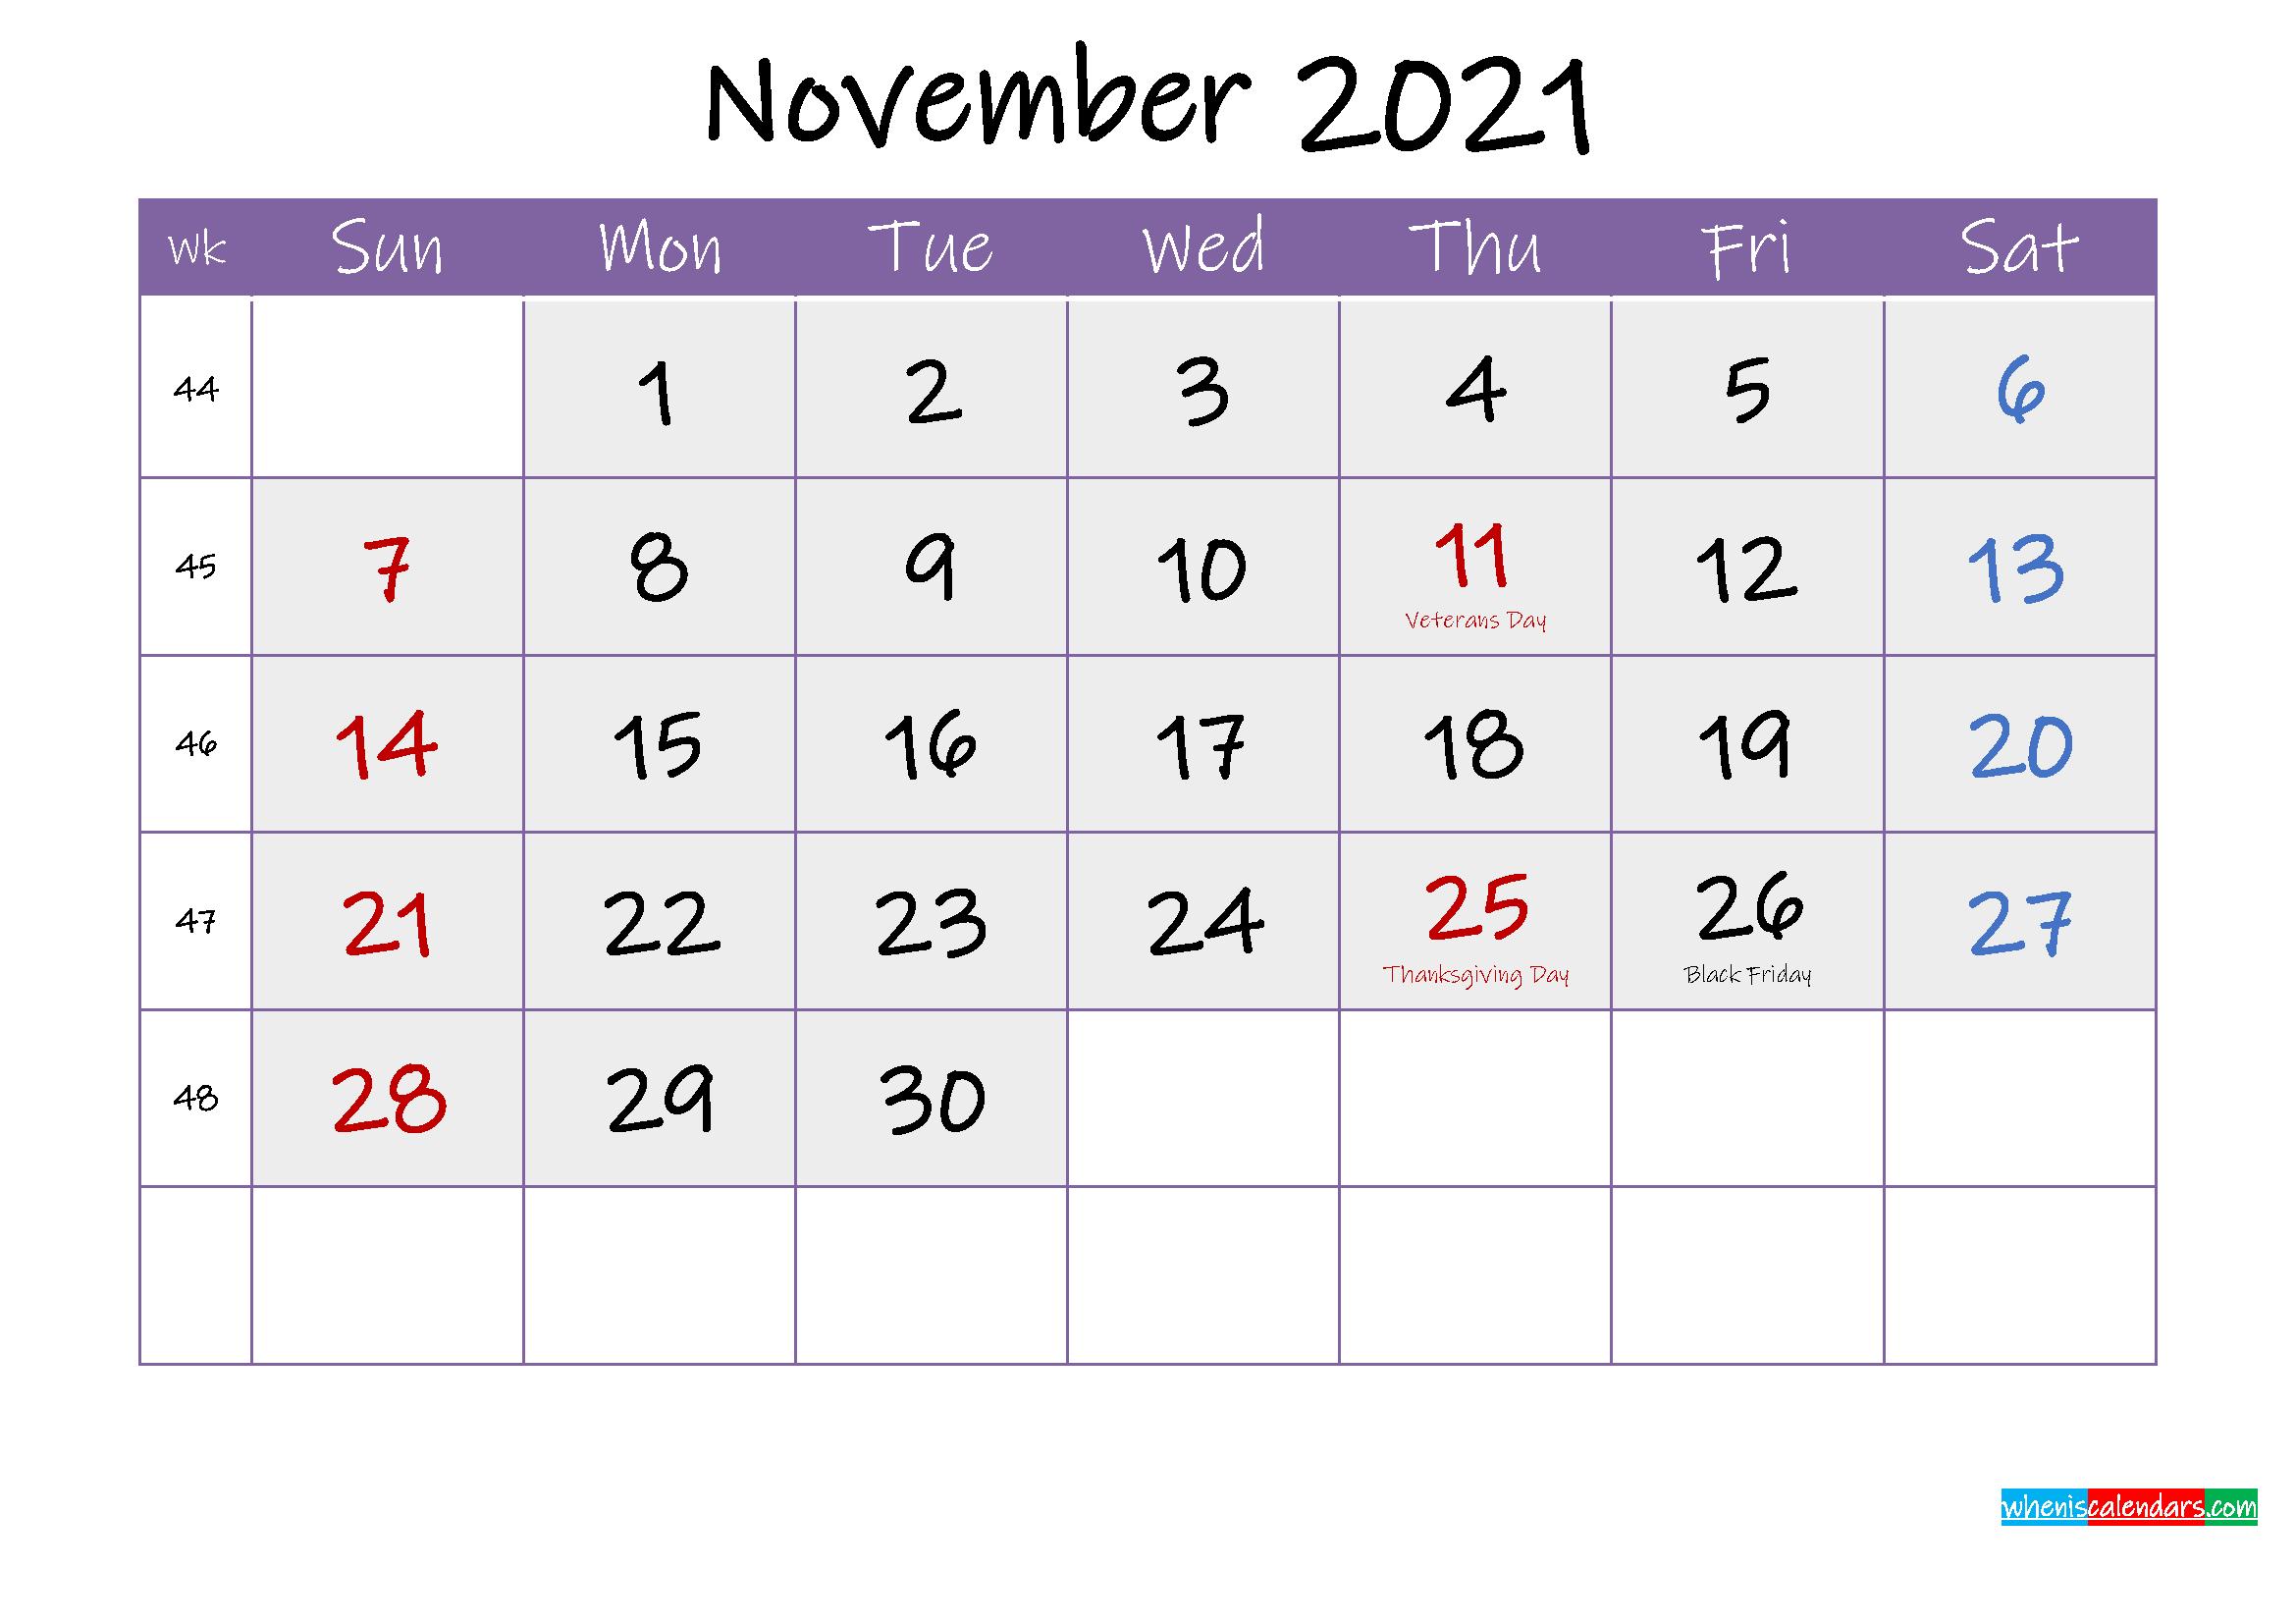 Free November 2021 Printable Calendar with Holidays